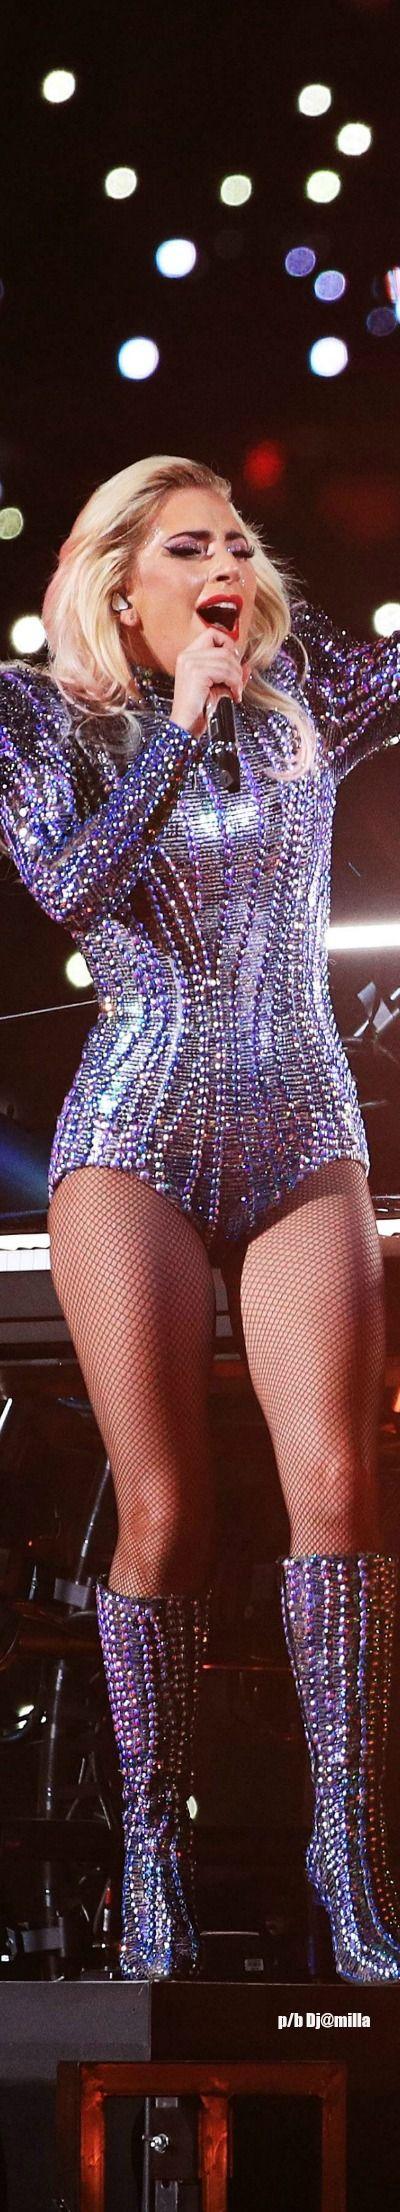 Amazing...Lady Gaga - Super Bowl 2017 - Halftime Performance!